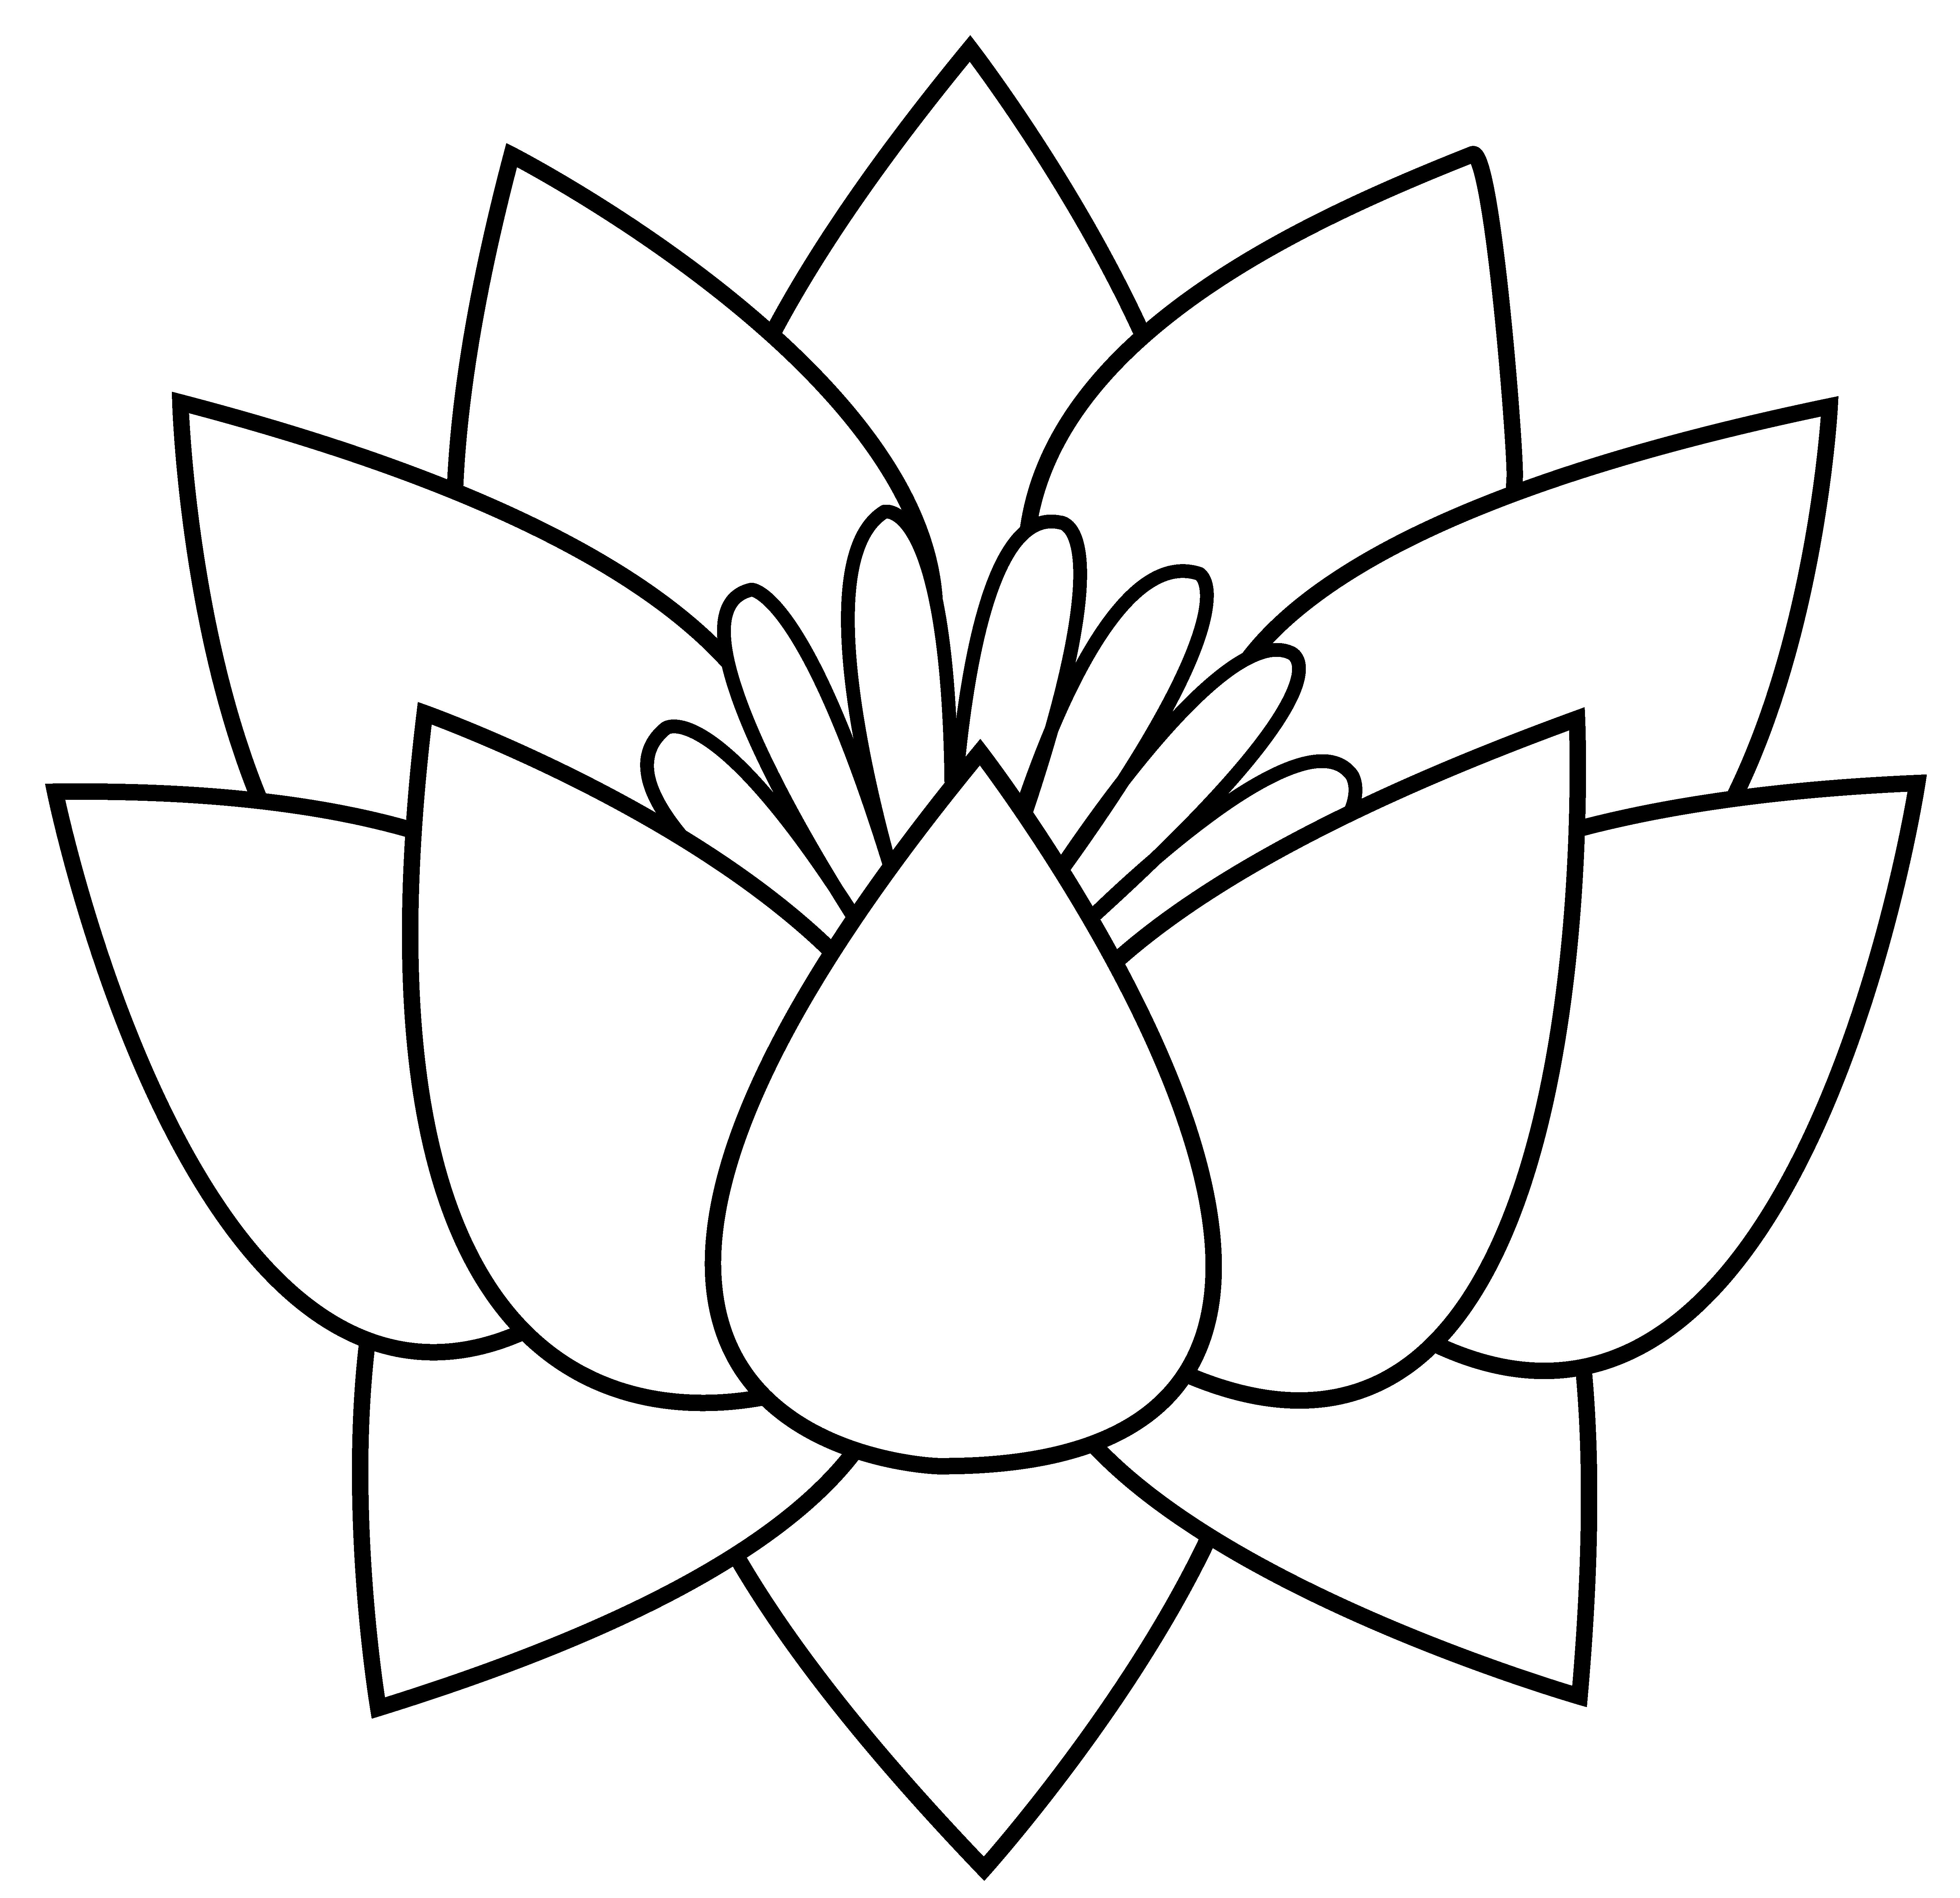 lotus_flower_lineart.png (5953×5764) Lotus flower